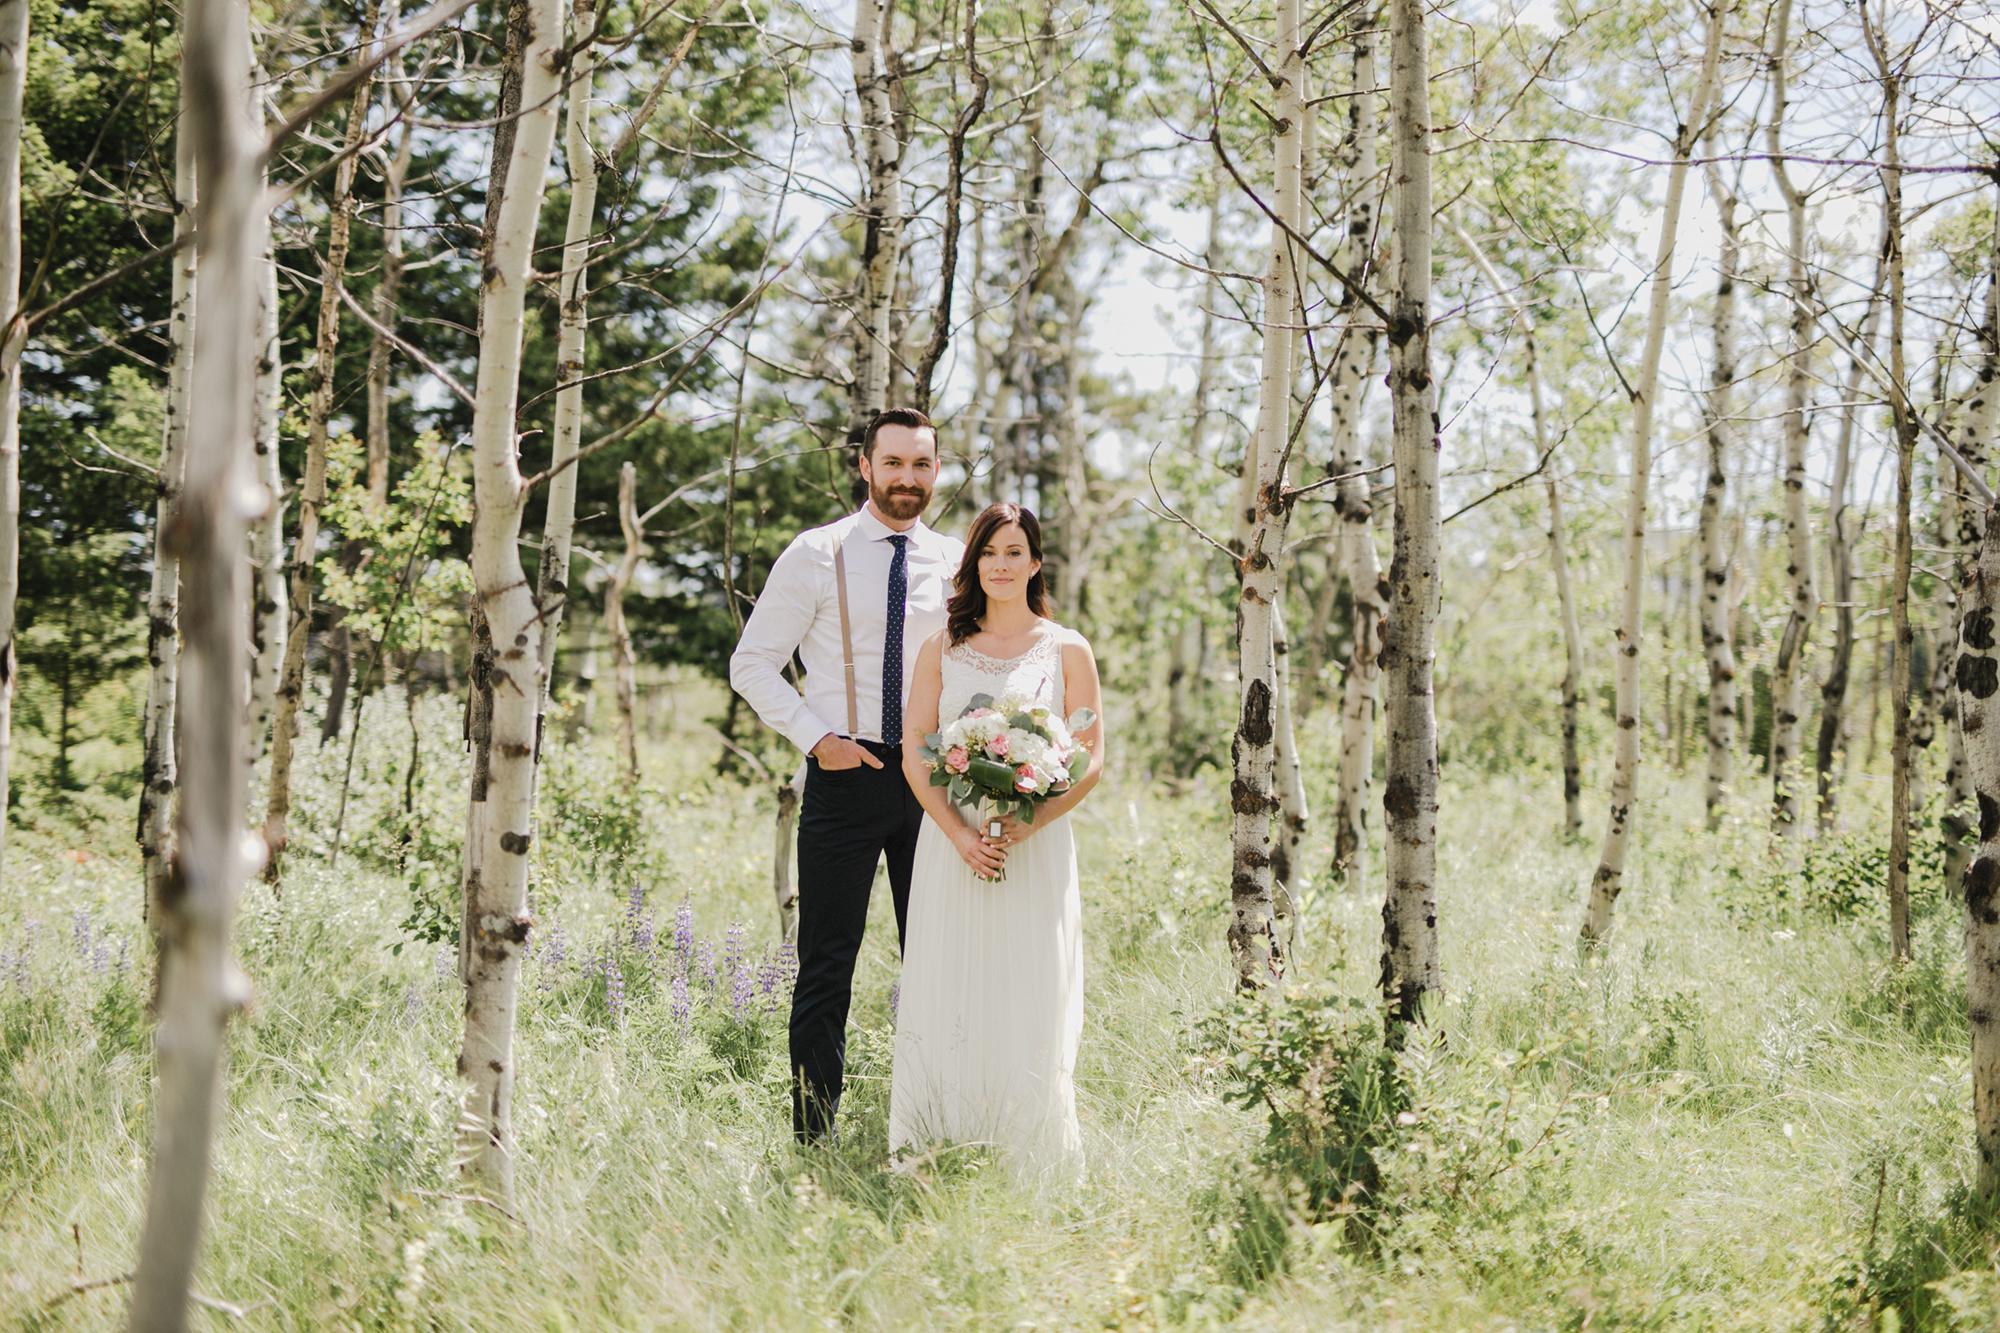 Flower Farm Crowsnest Pass Wedding -031.JPG